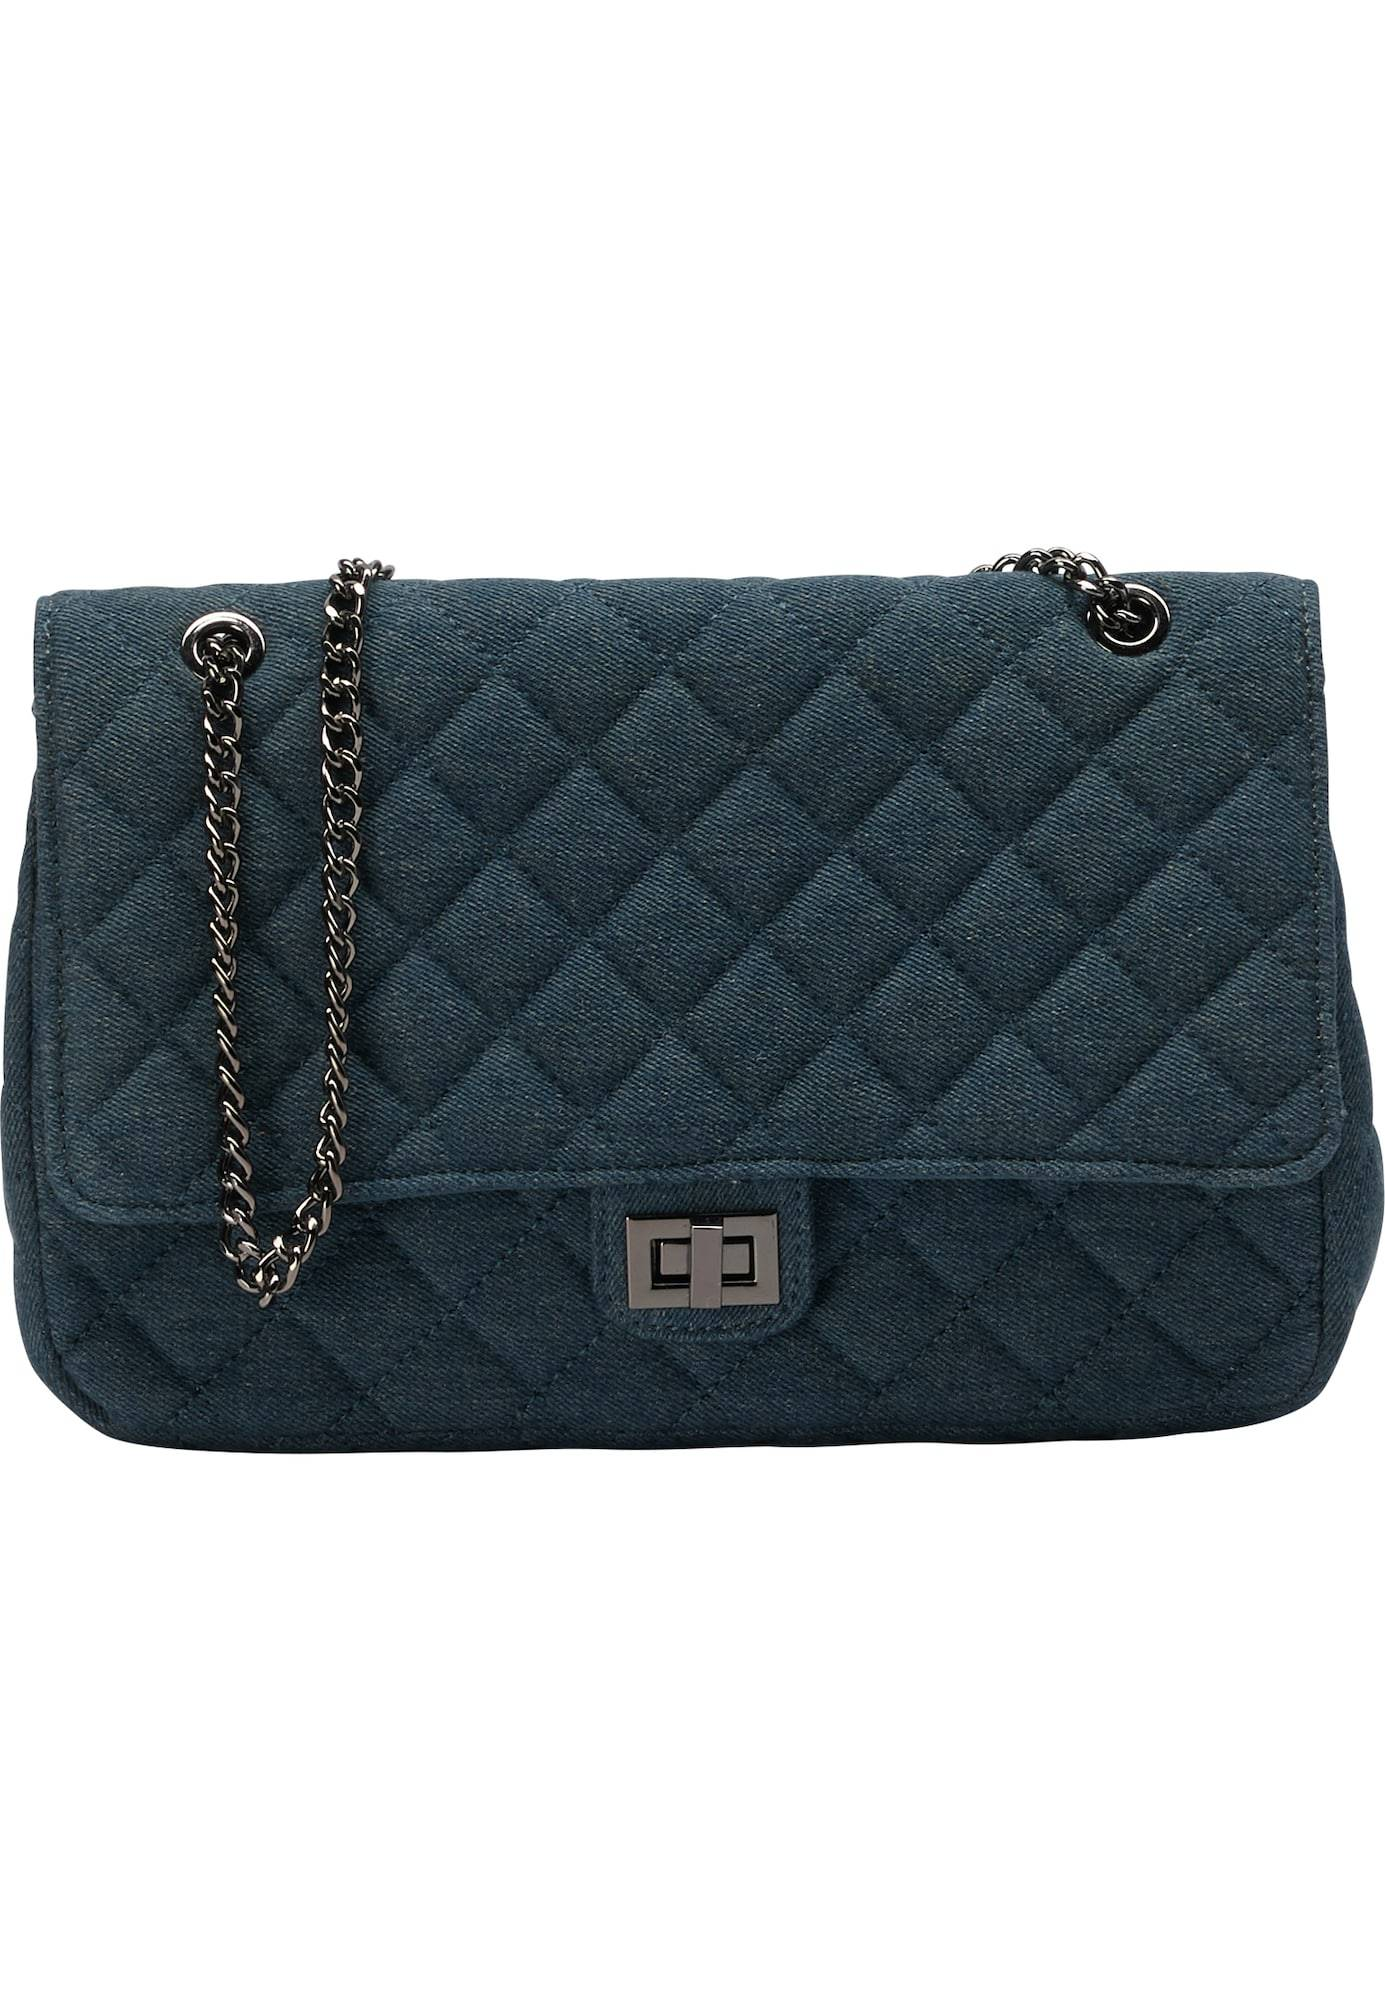 DreiMaster Vintage Sac bandoulière  - Bleu - Taille: One Size - female